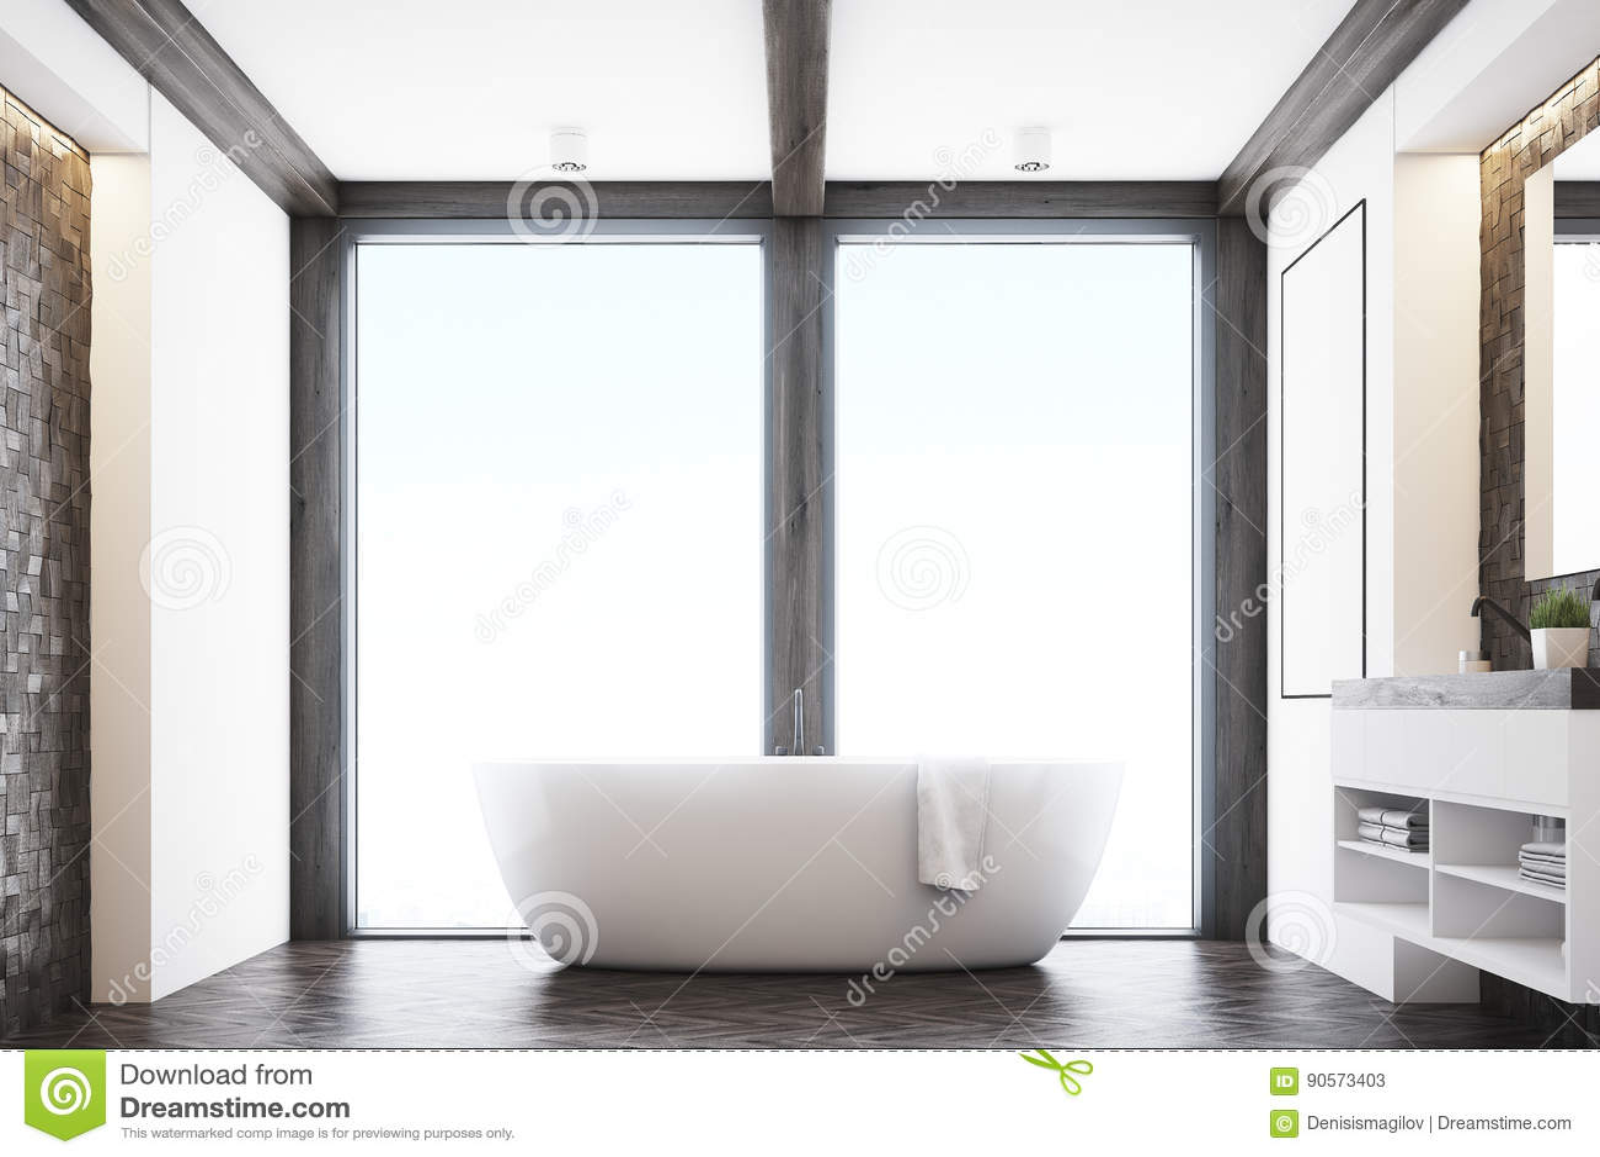 Dark tile bathroom, window stock illustration. Illustration of ...